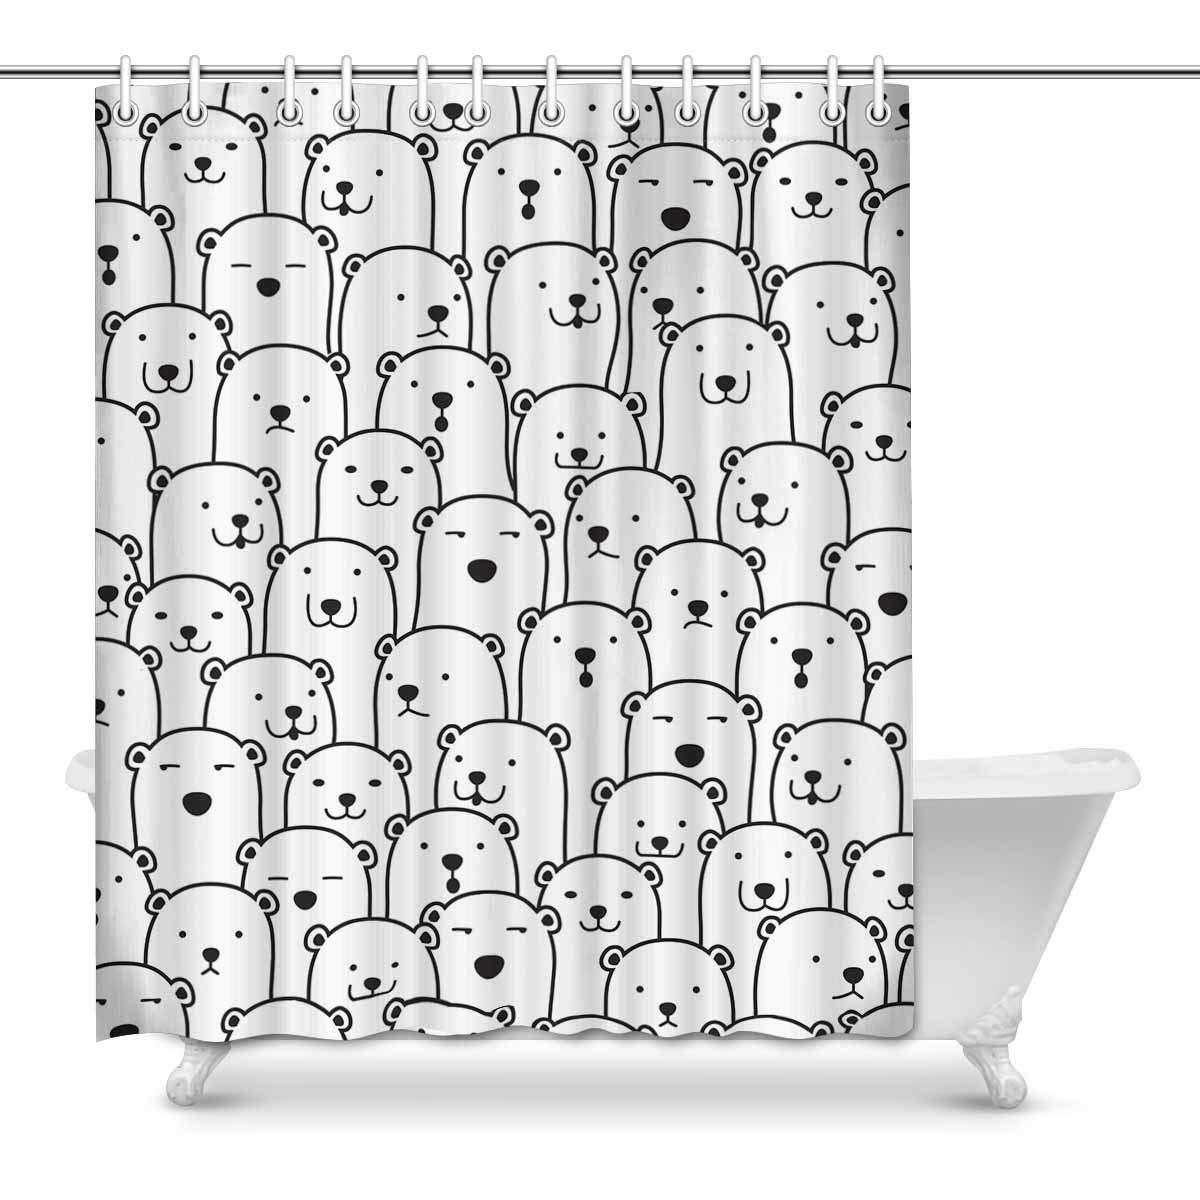 Polar Bear Pattern Home Bath Decor, Cute Cartoon Animals Polyester Fabric Shower Curtain Bathroom Sets 60 X 72 Inches jiaxingpuruog